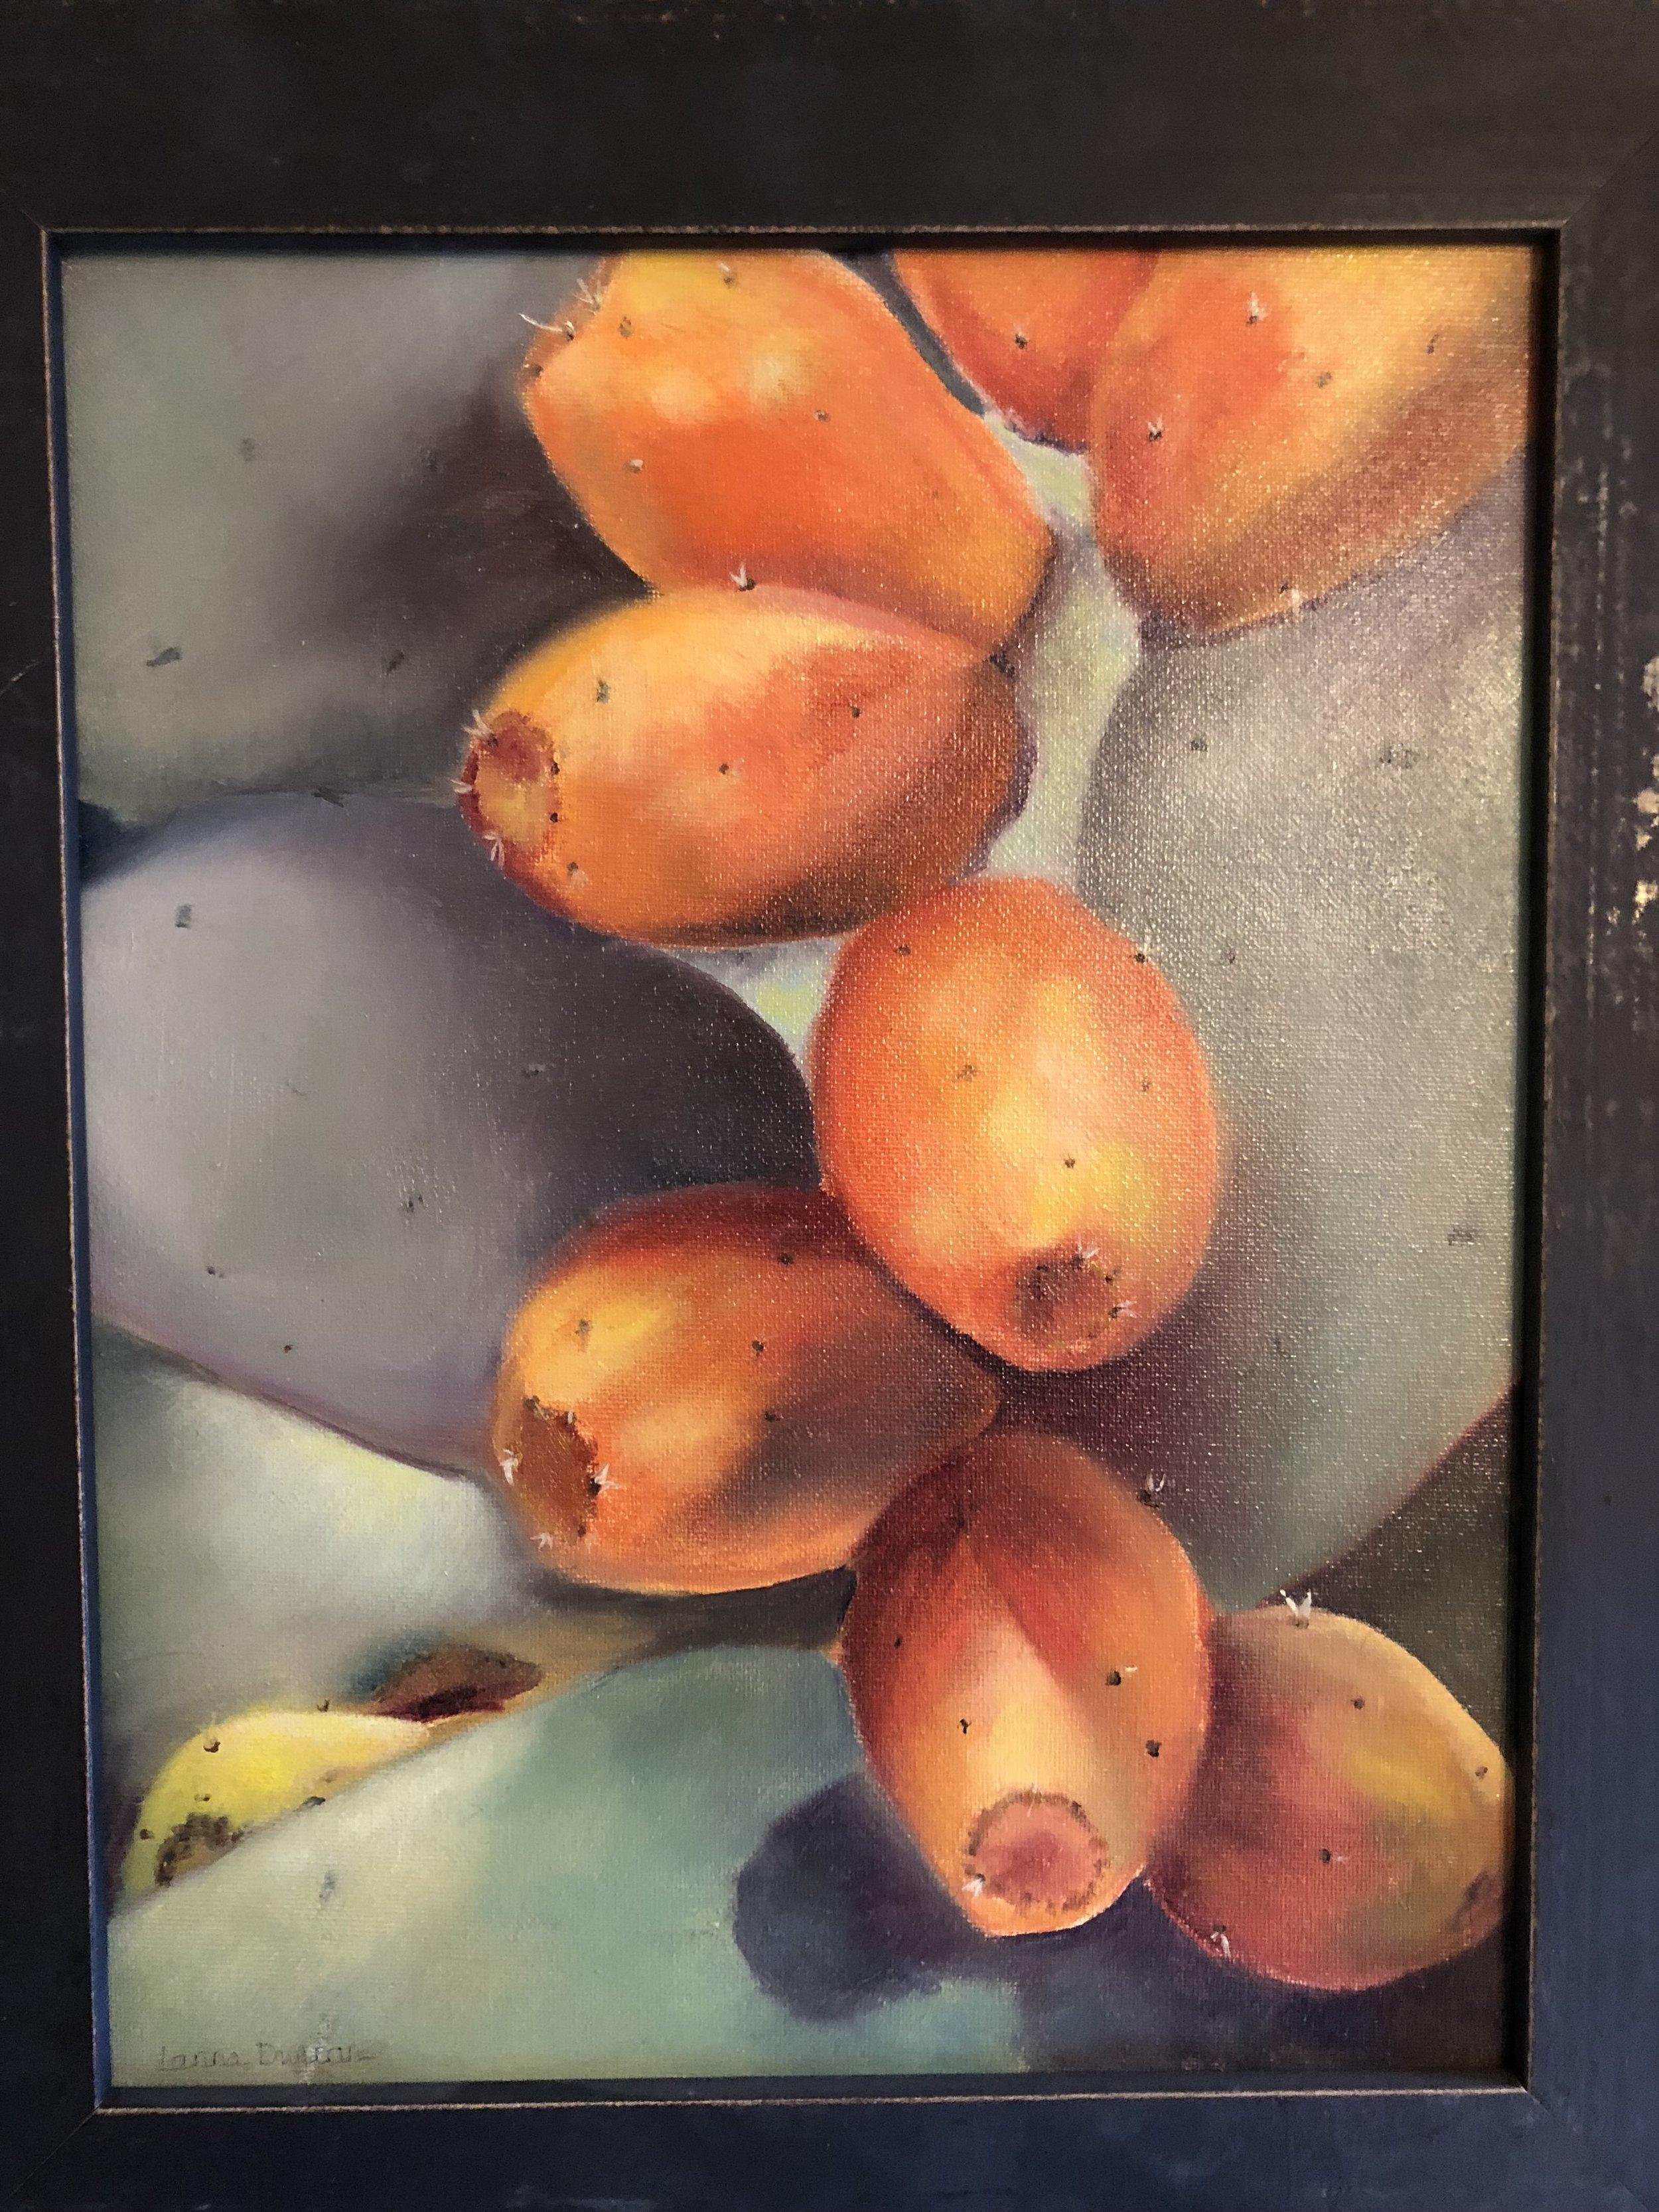 Prickly Pear Cactus Study 1